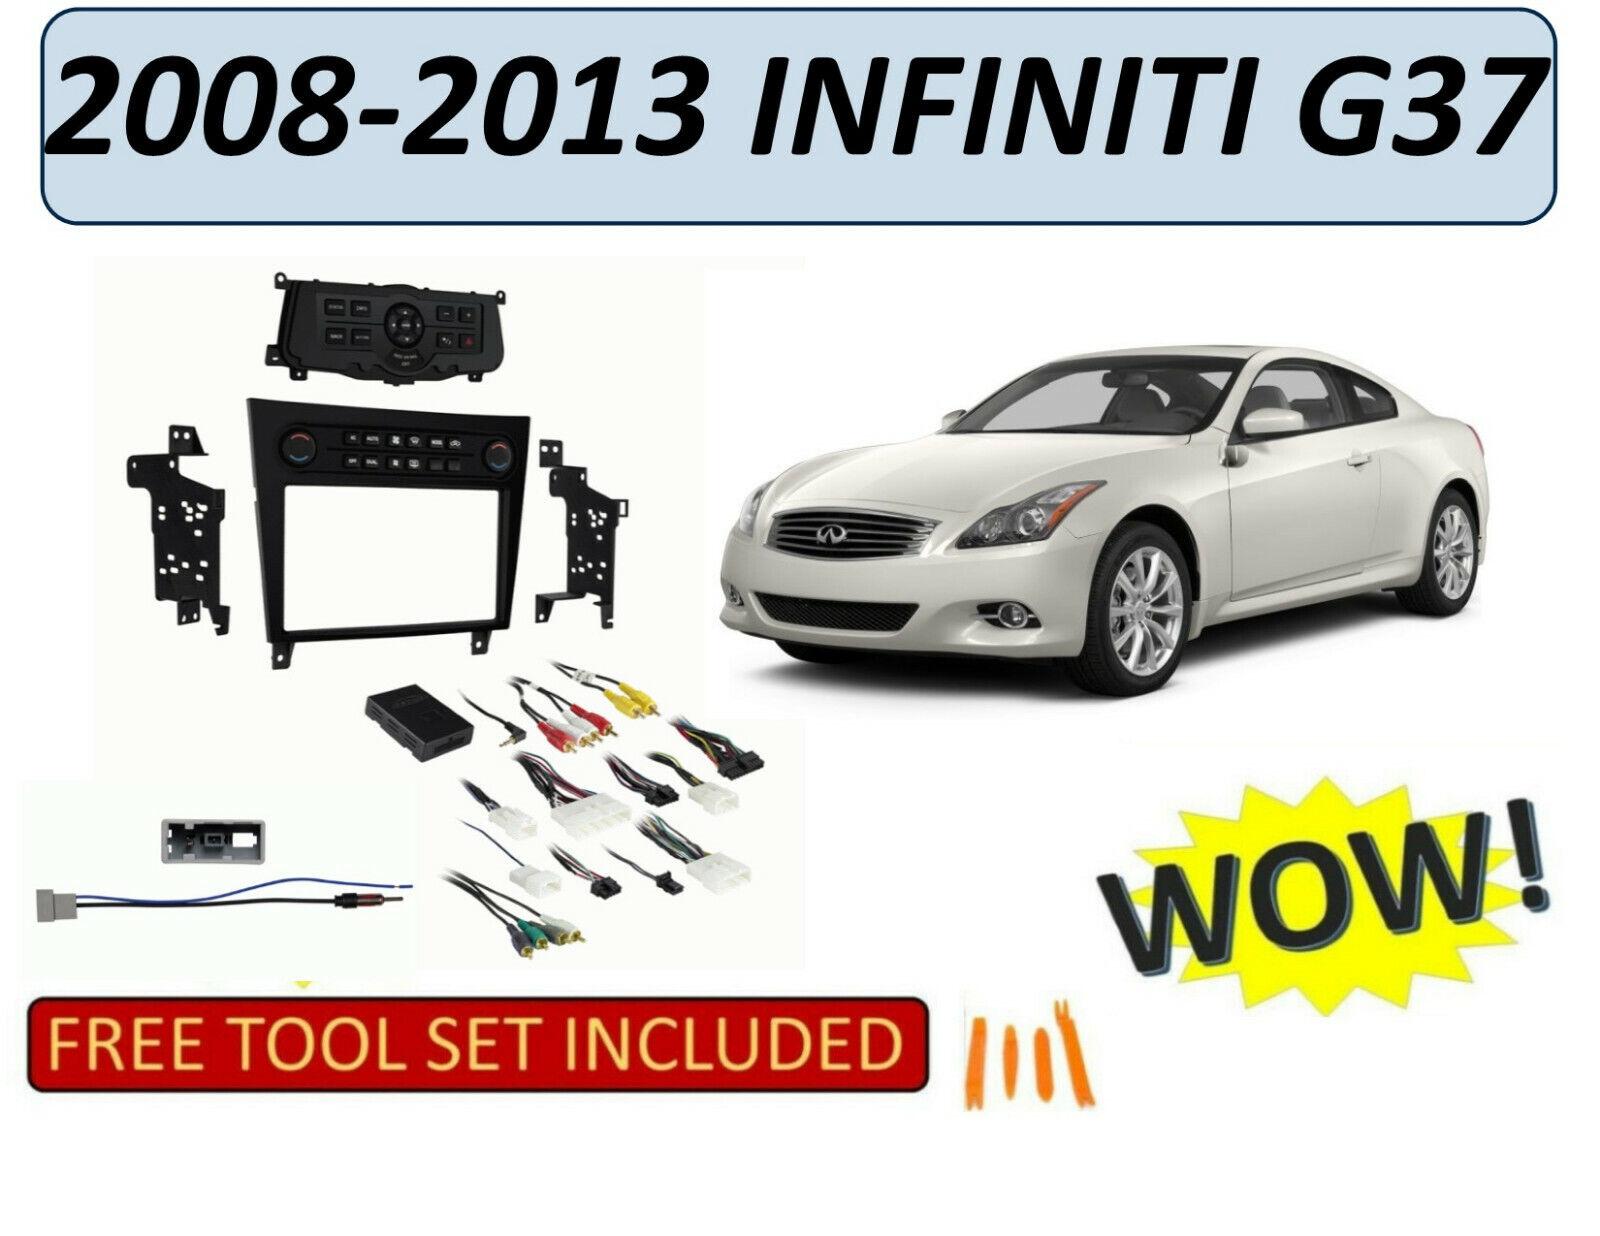 hight resolution of metra 99 7625b 2008 2013 infiniti g37 installation kit for sale online ebay